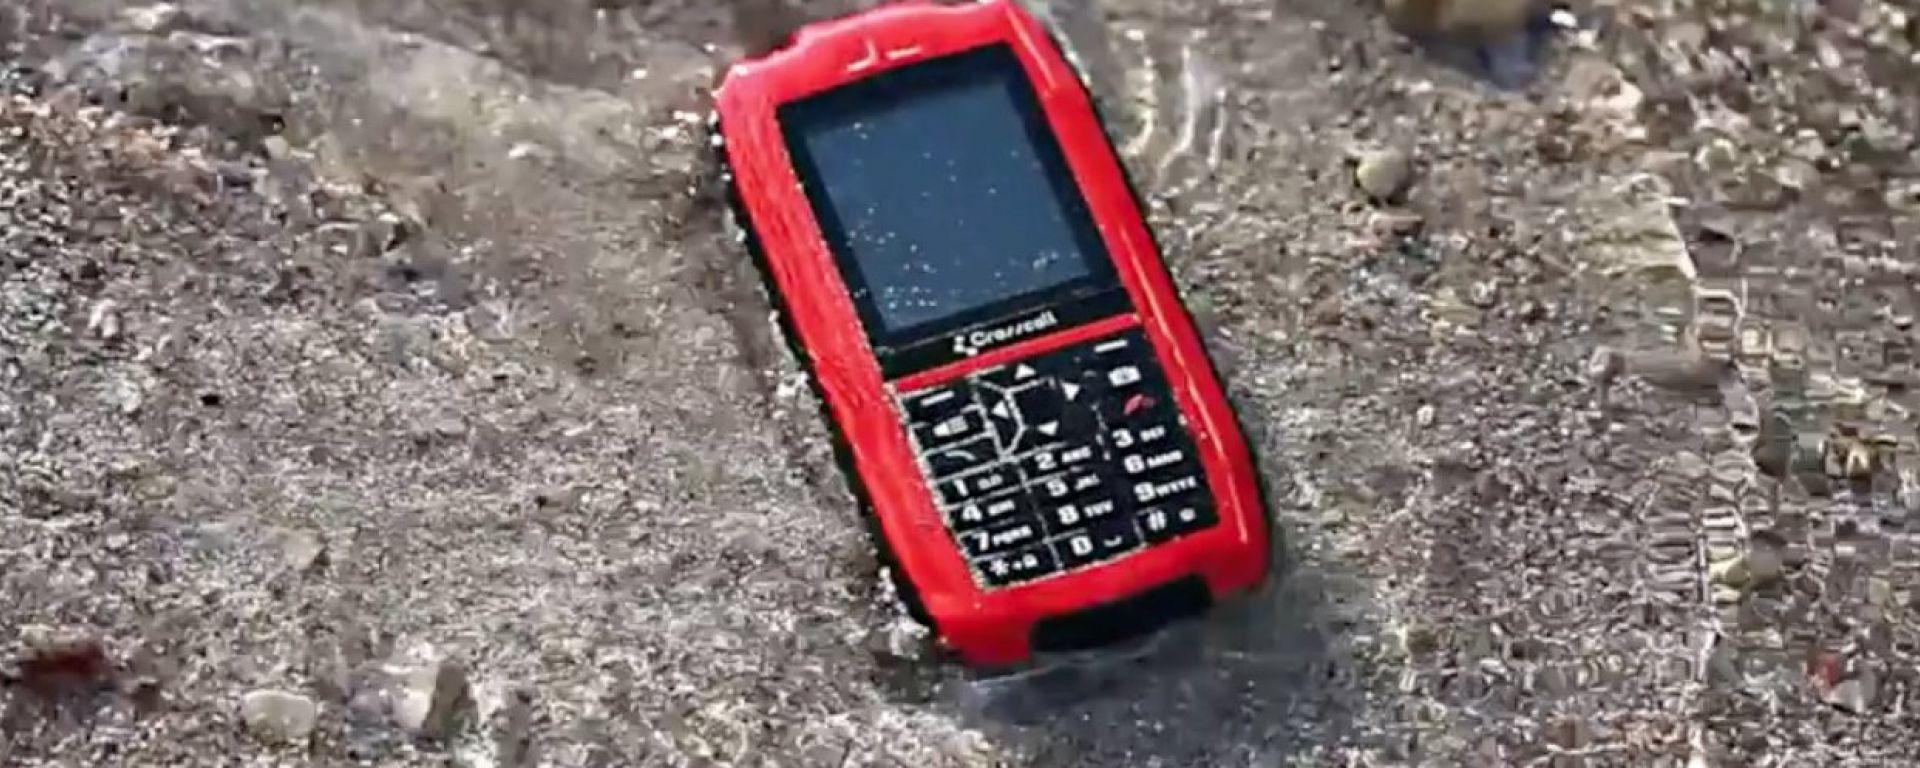 Crosscall Shark-V2: il telefonino galleggiante